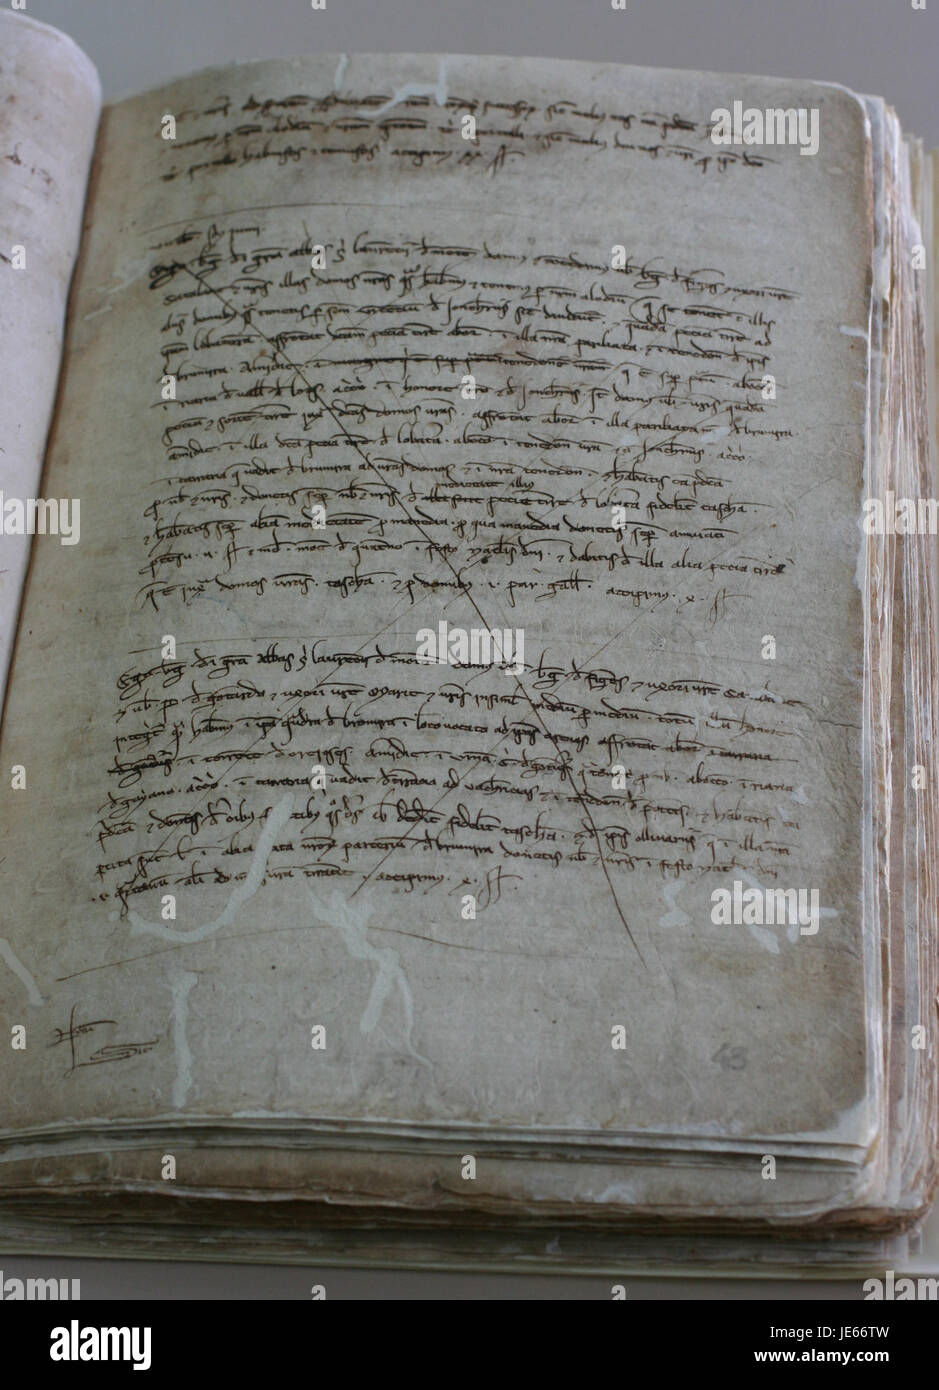 Capbreu bertran acolit 1237-1242f. 43r acvoc - Stock Image